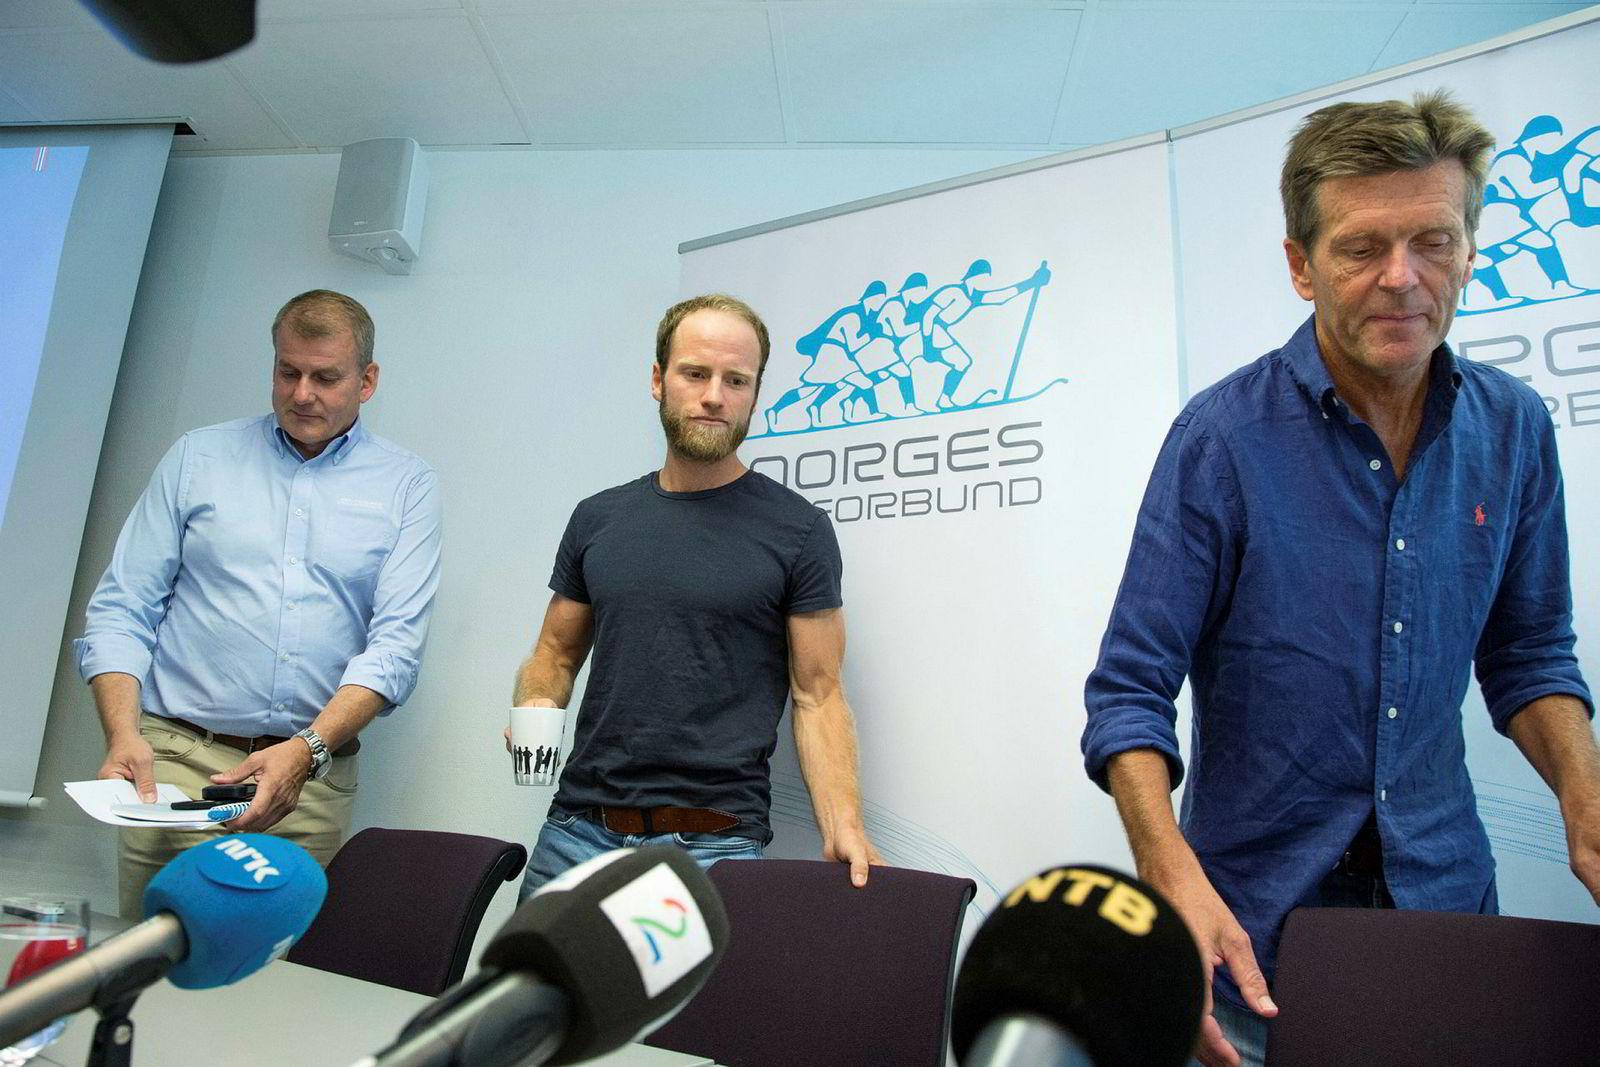 Martin Johnsrud Sundby sammen med skipresident Erik Røste (t.v.), og landslagslege Knut Gabrielsen under Norges Skiforbunds pressekonferanse i sommer da utestengelsen av skiløperen ble offentliggjort.